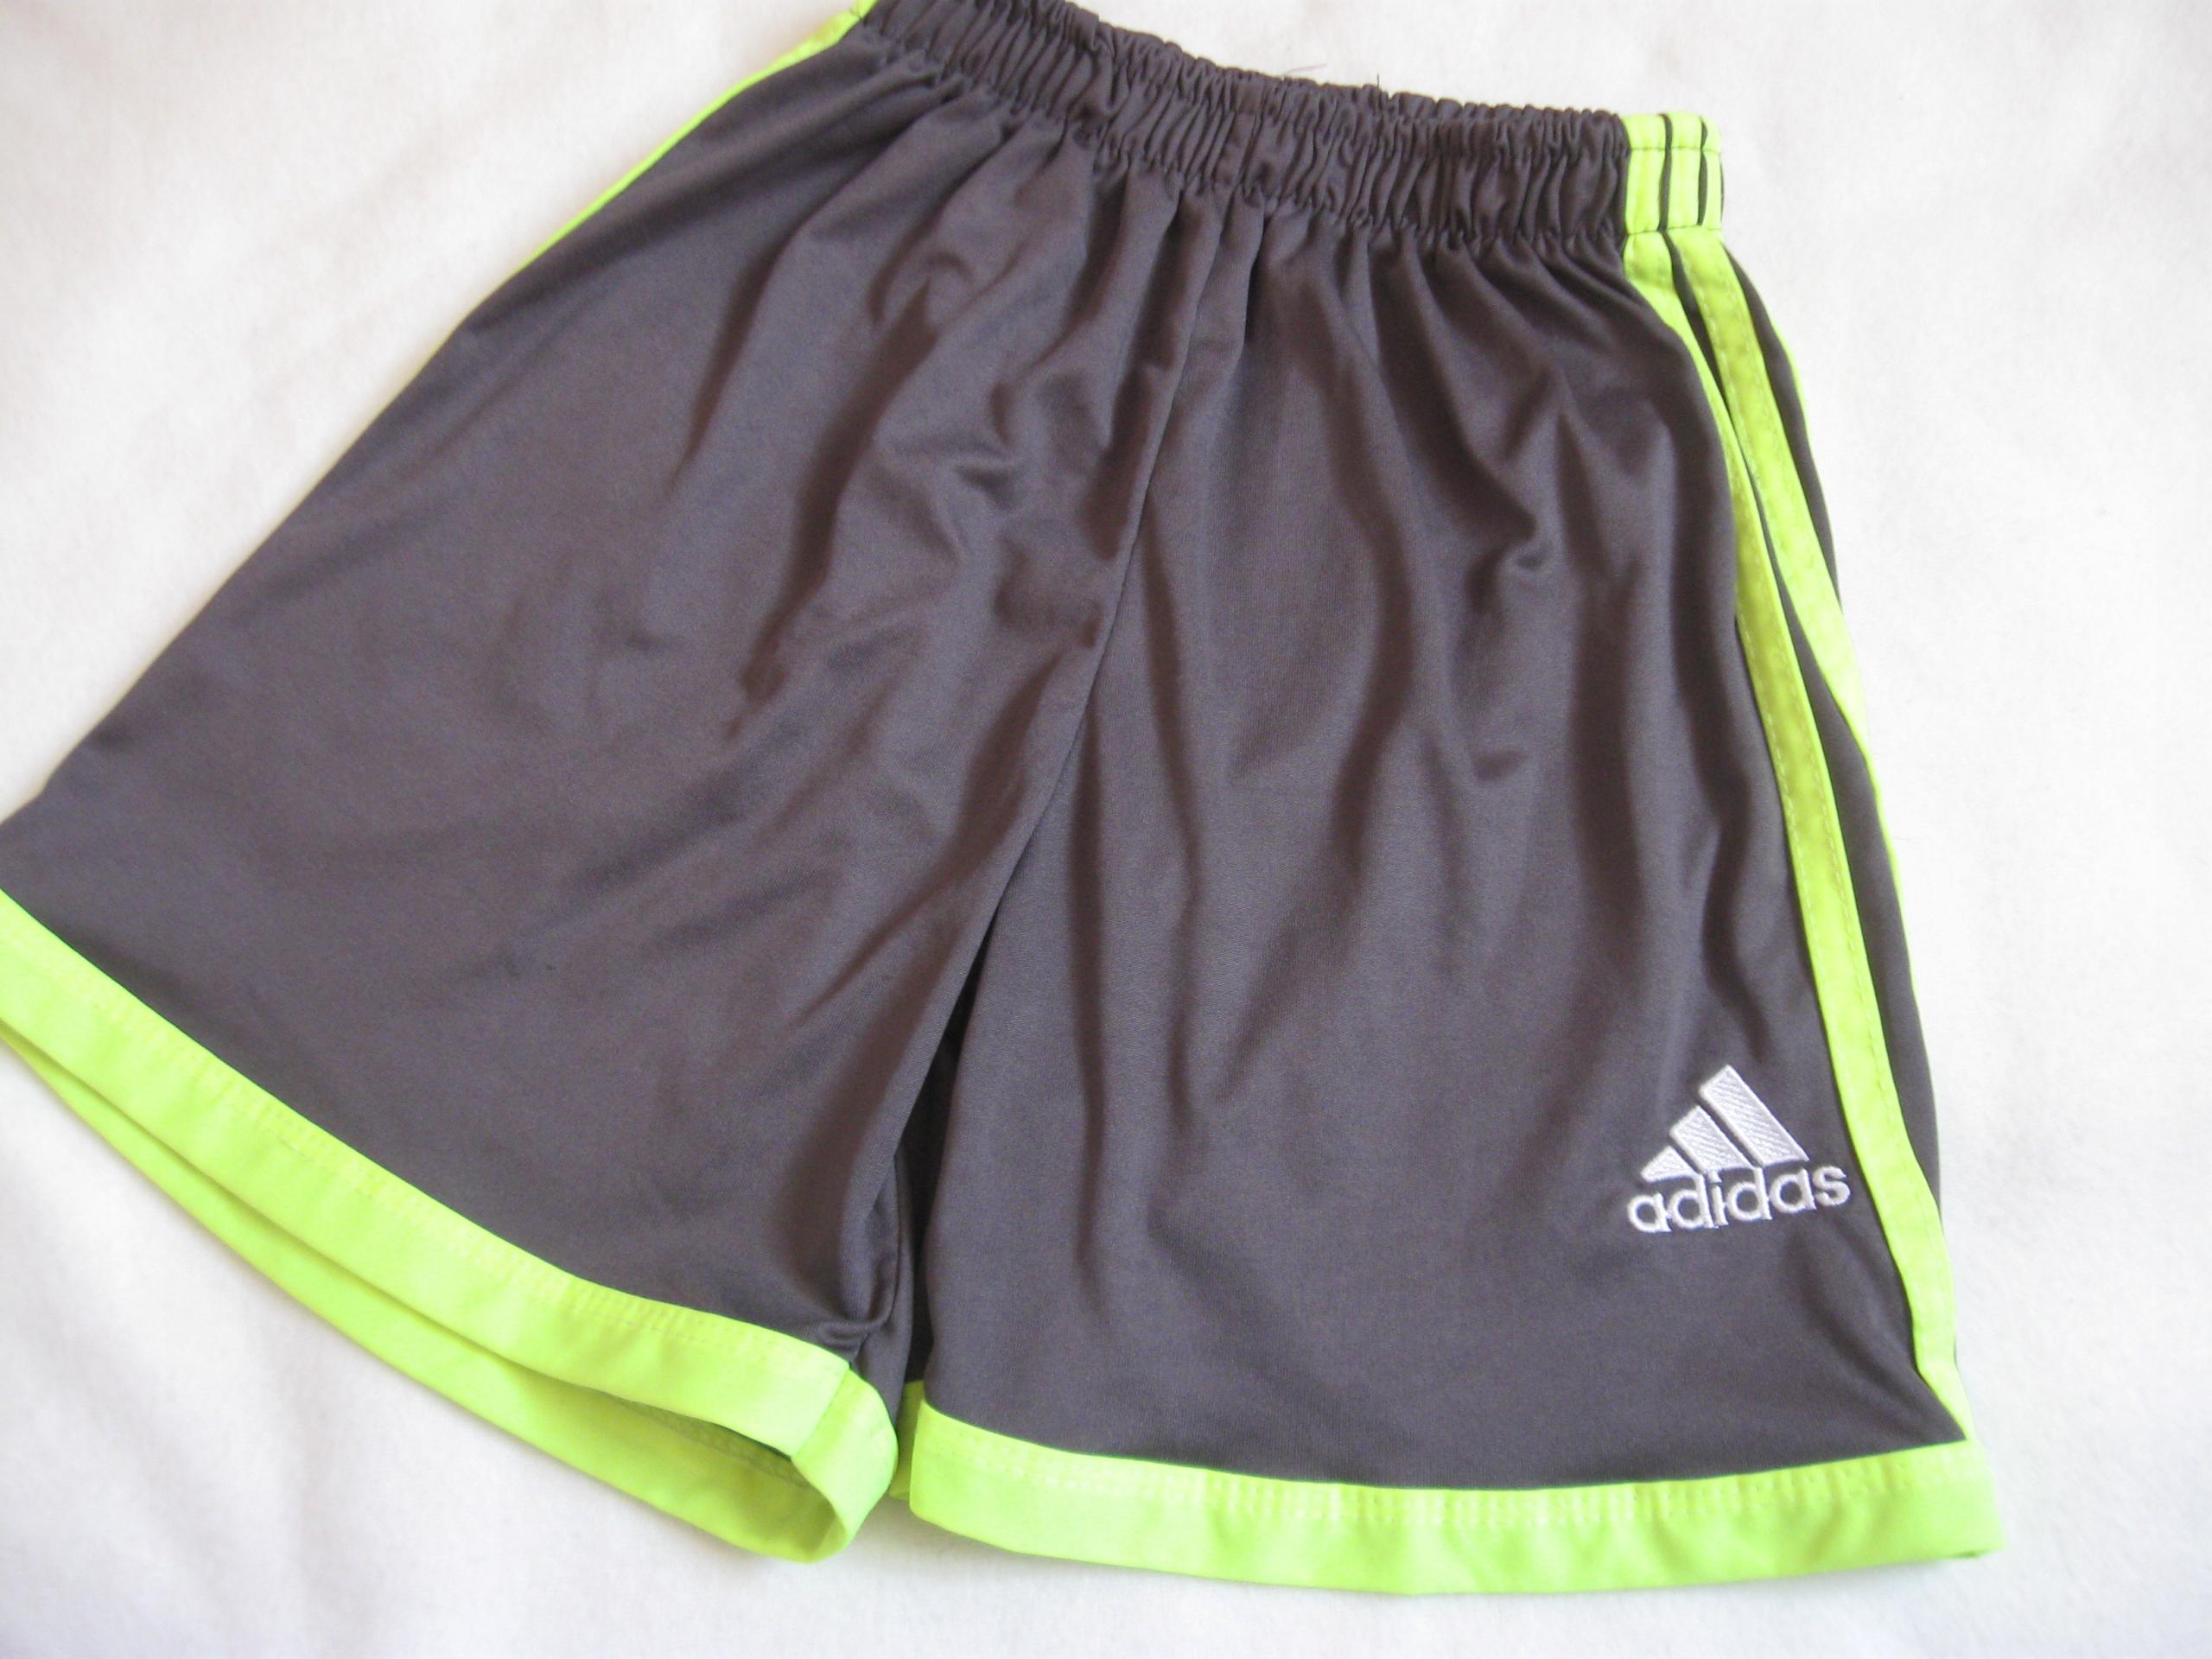 Adidas_Spodenki na 140 cm